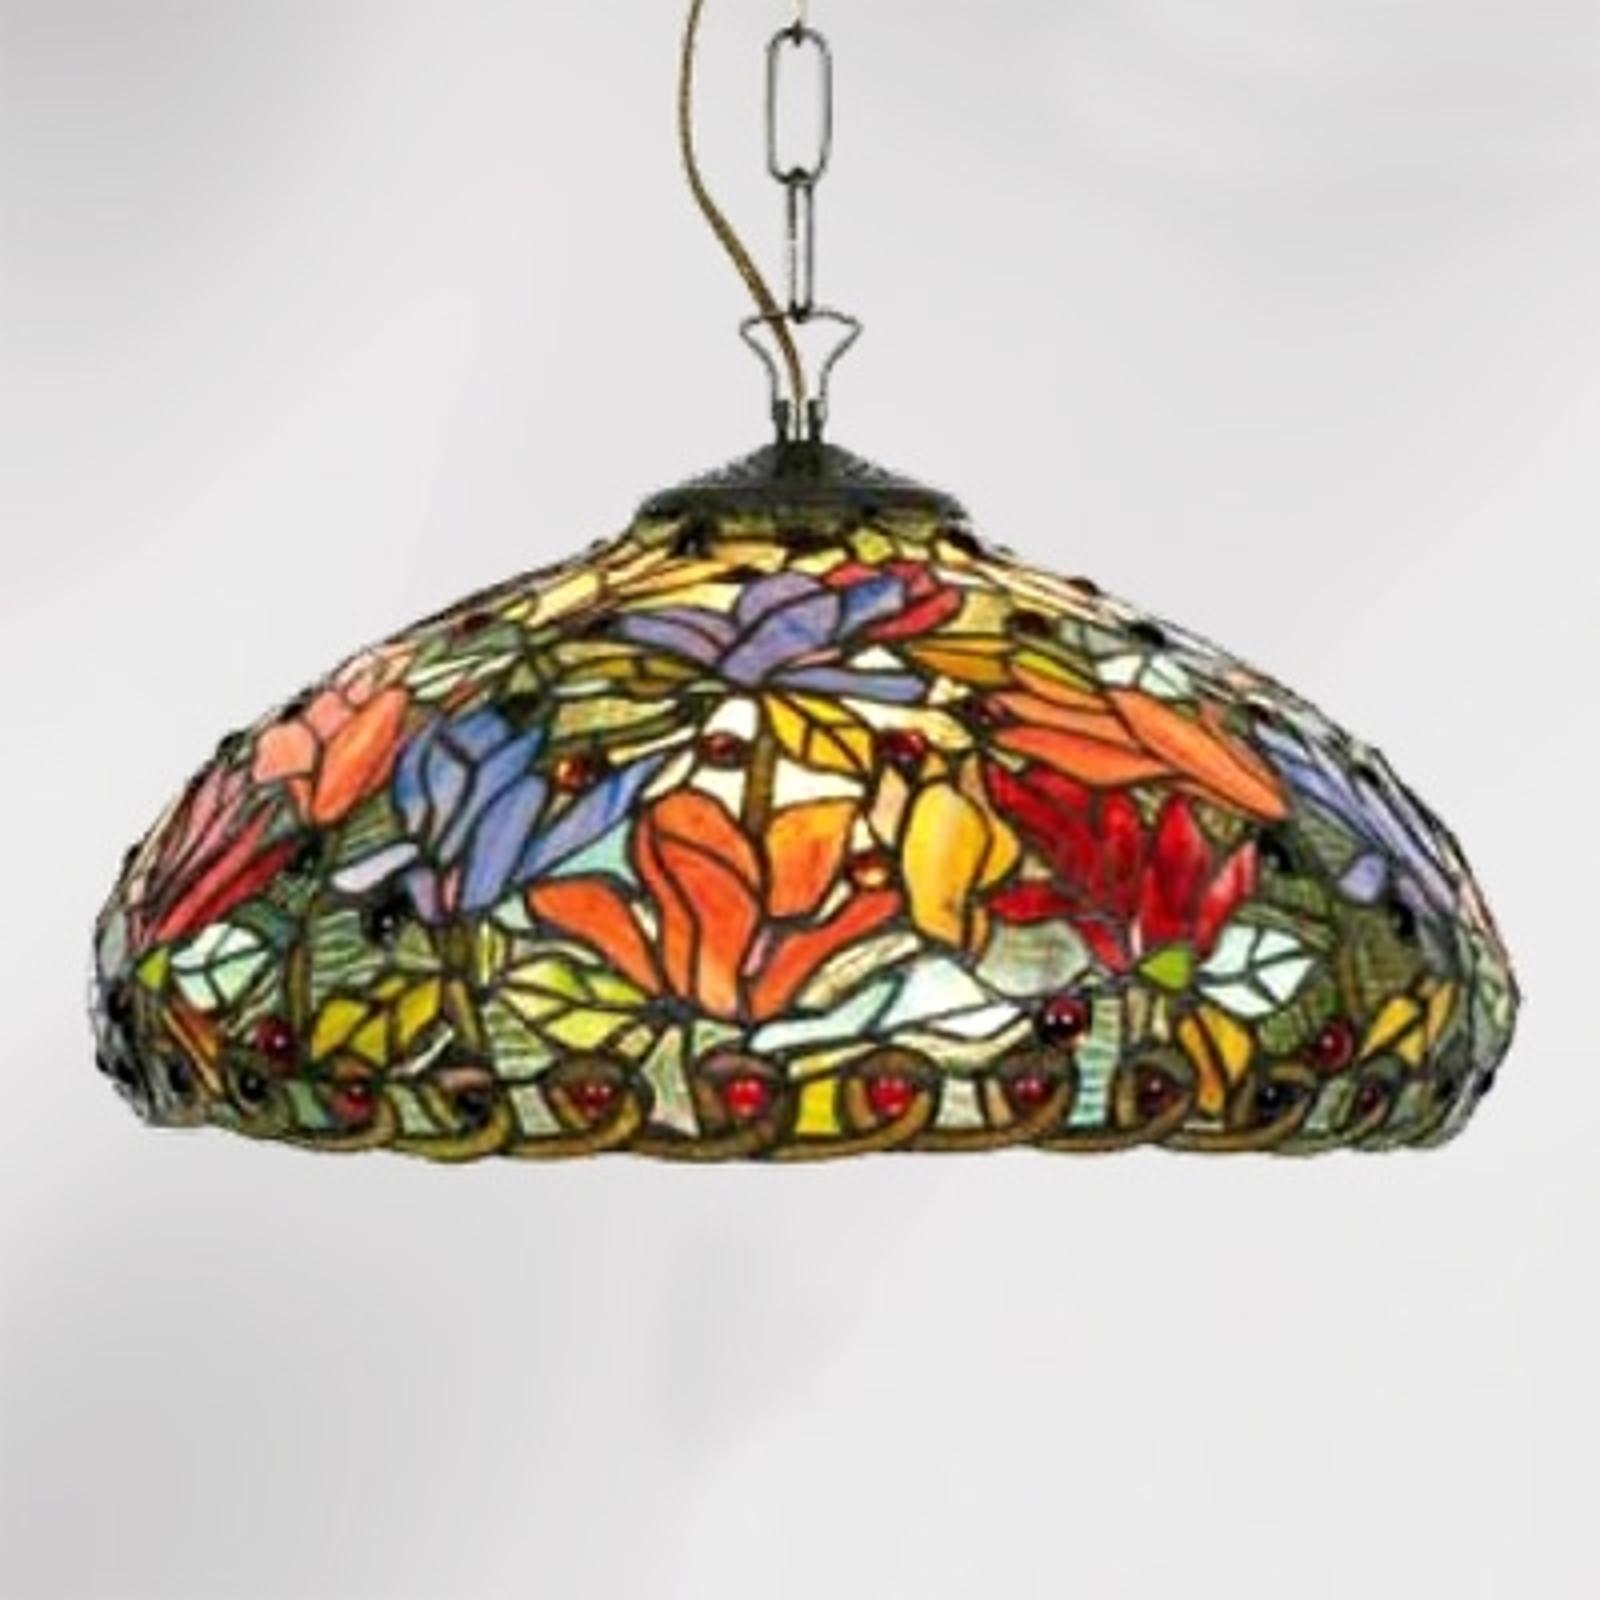 Hanging light Elaine, floral Tiffany style, 2-bulb_1032252_1